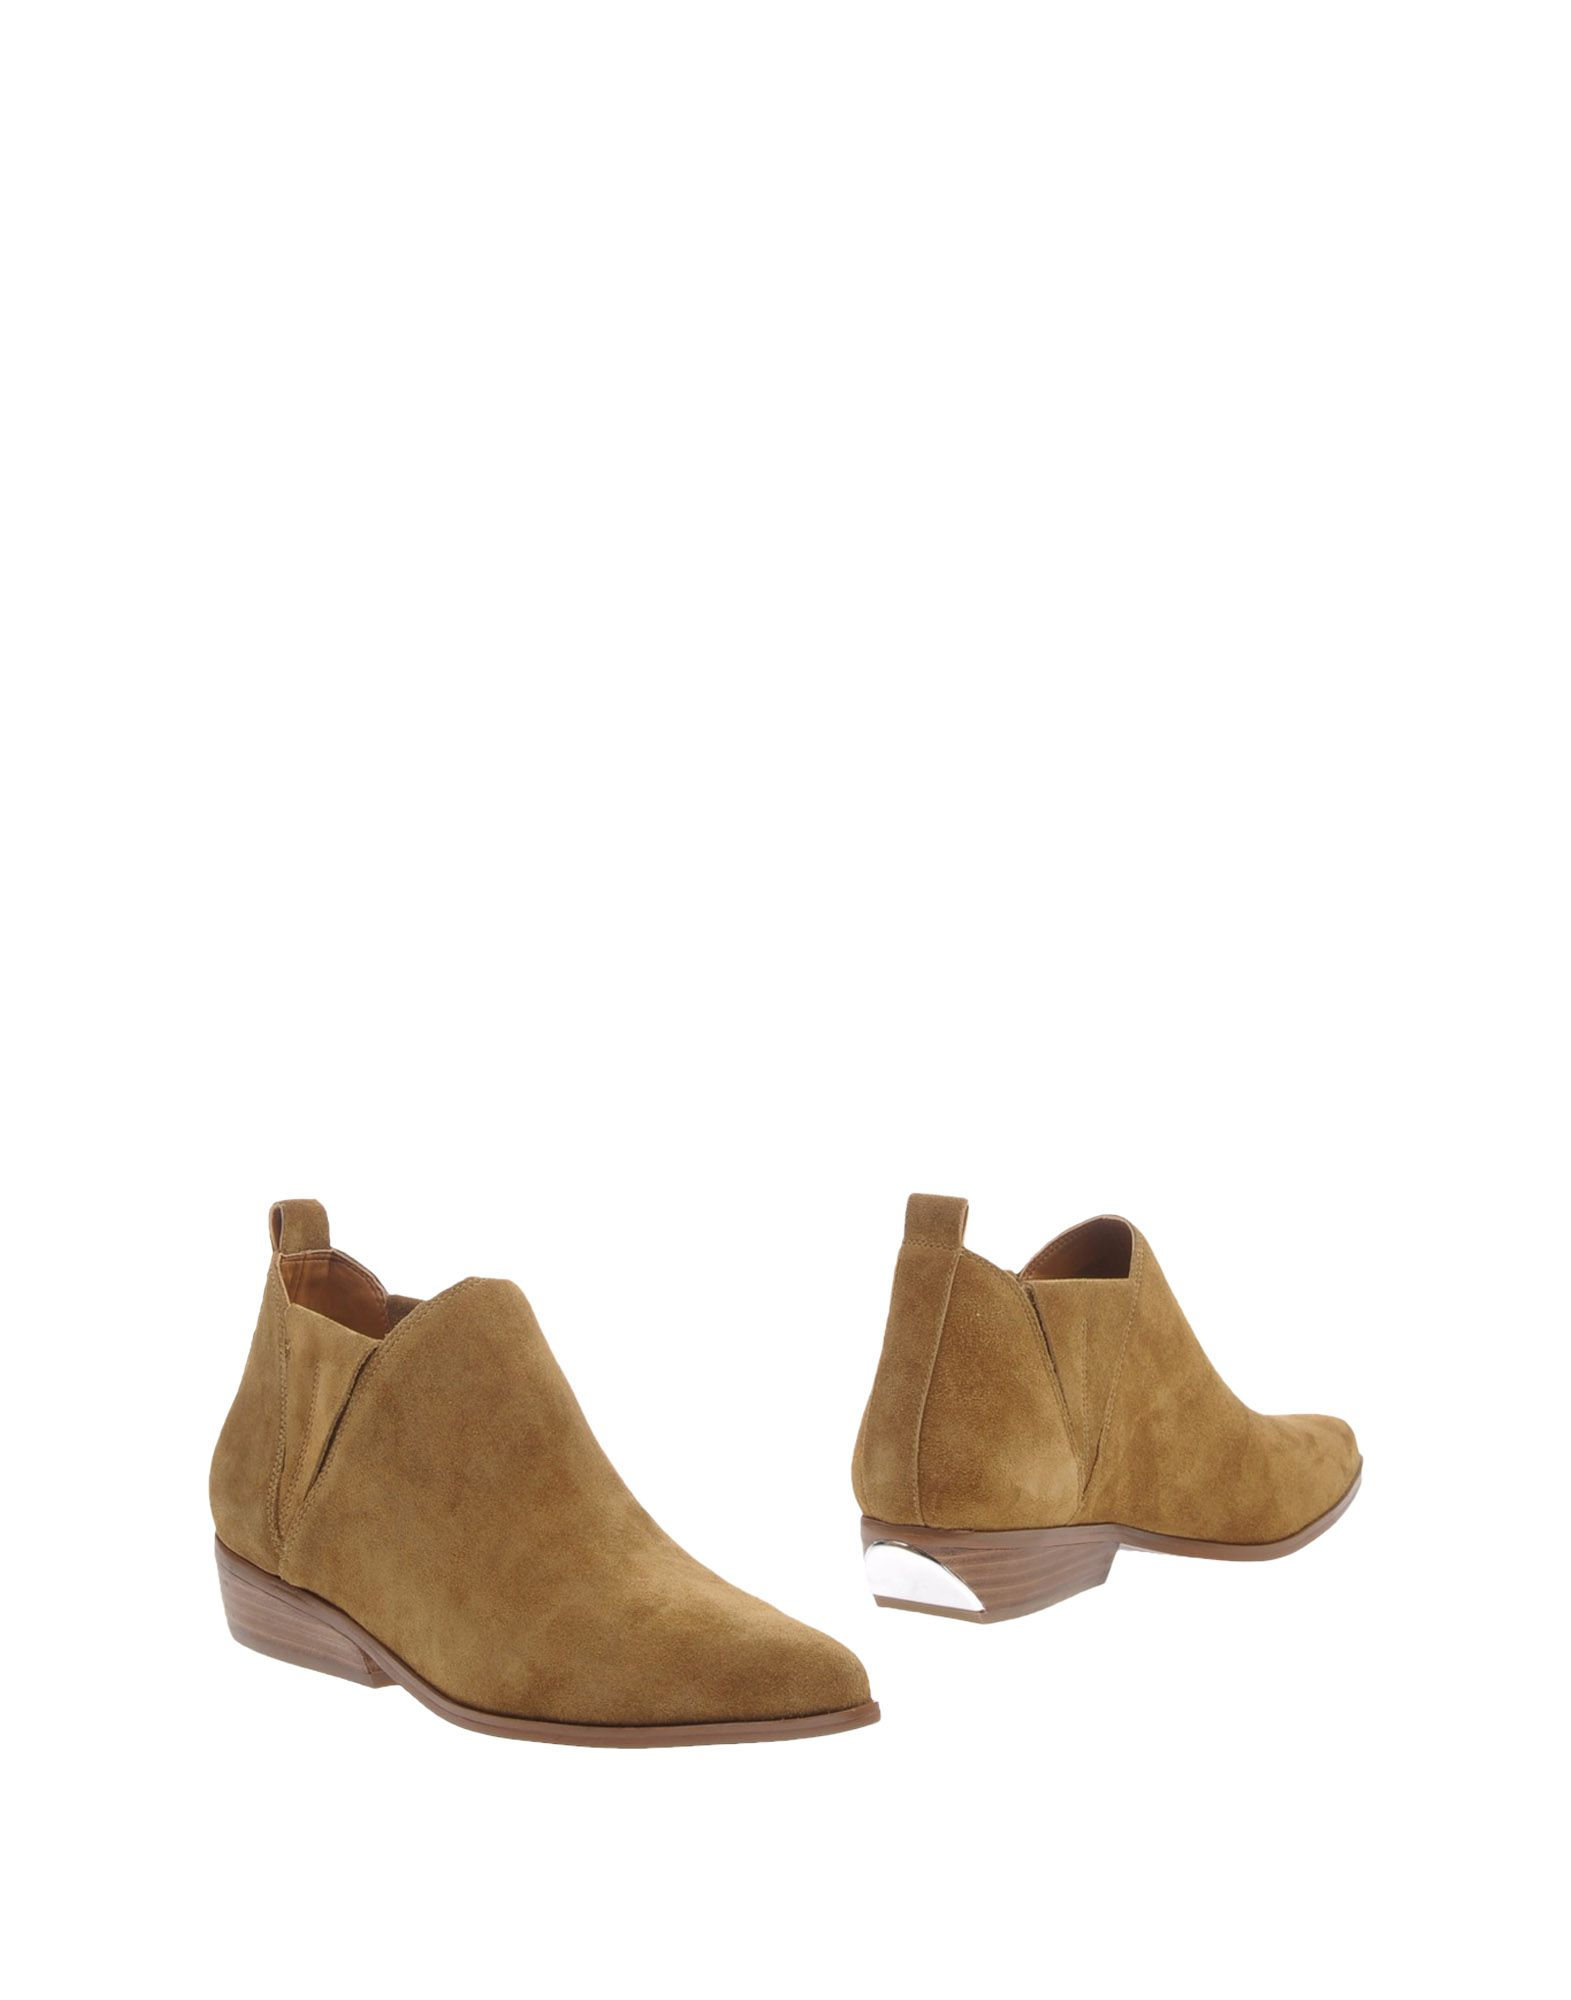 Kendall + Kylie Kylie + Stiefelette Damen  11219112UN Gute Qualität beliebte Schuhe 42552e